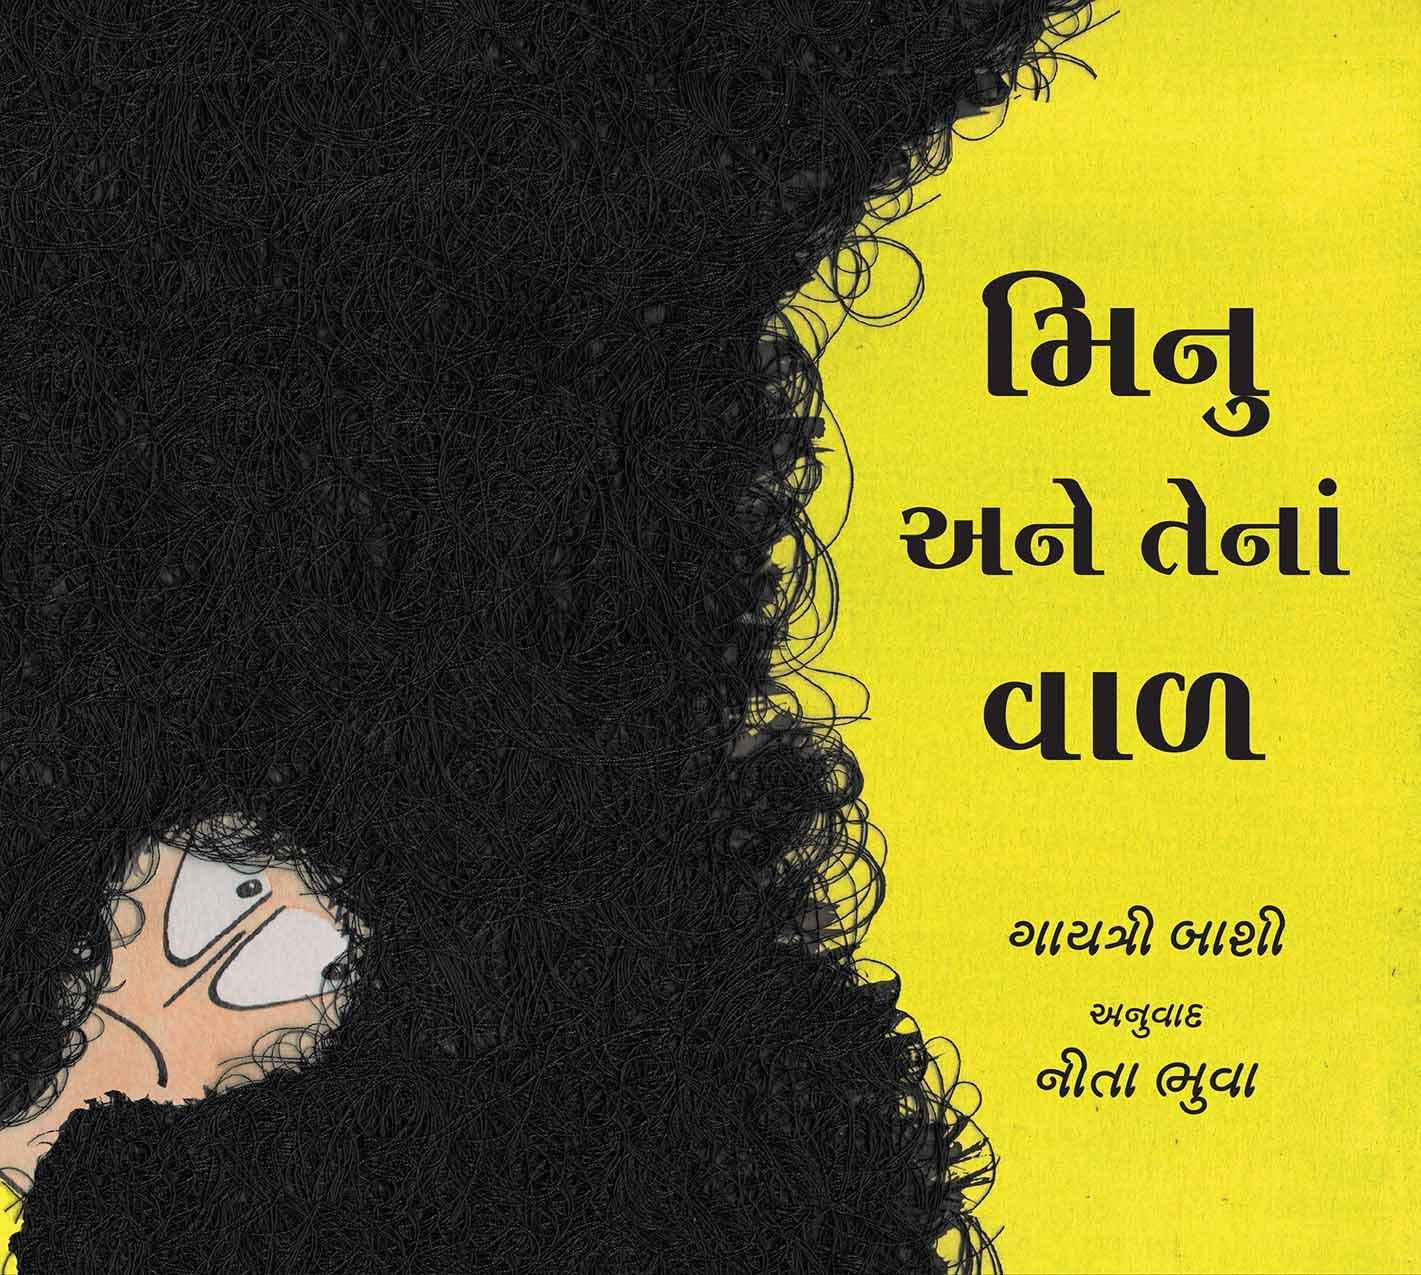 Minu And Her Hair/Minu Aney Tena Vaal (Gujarati)